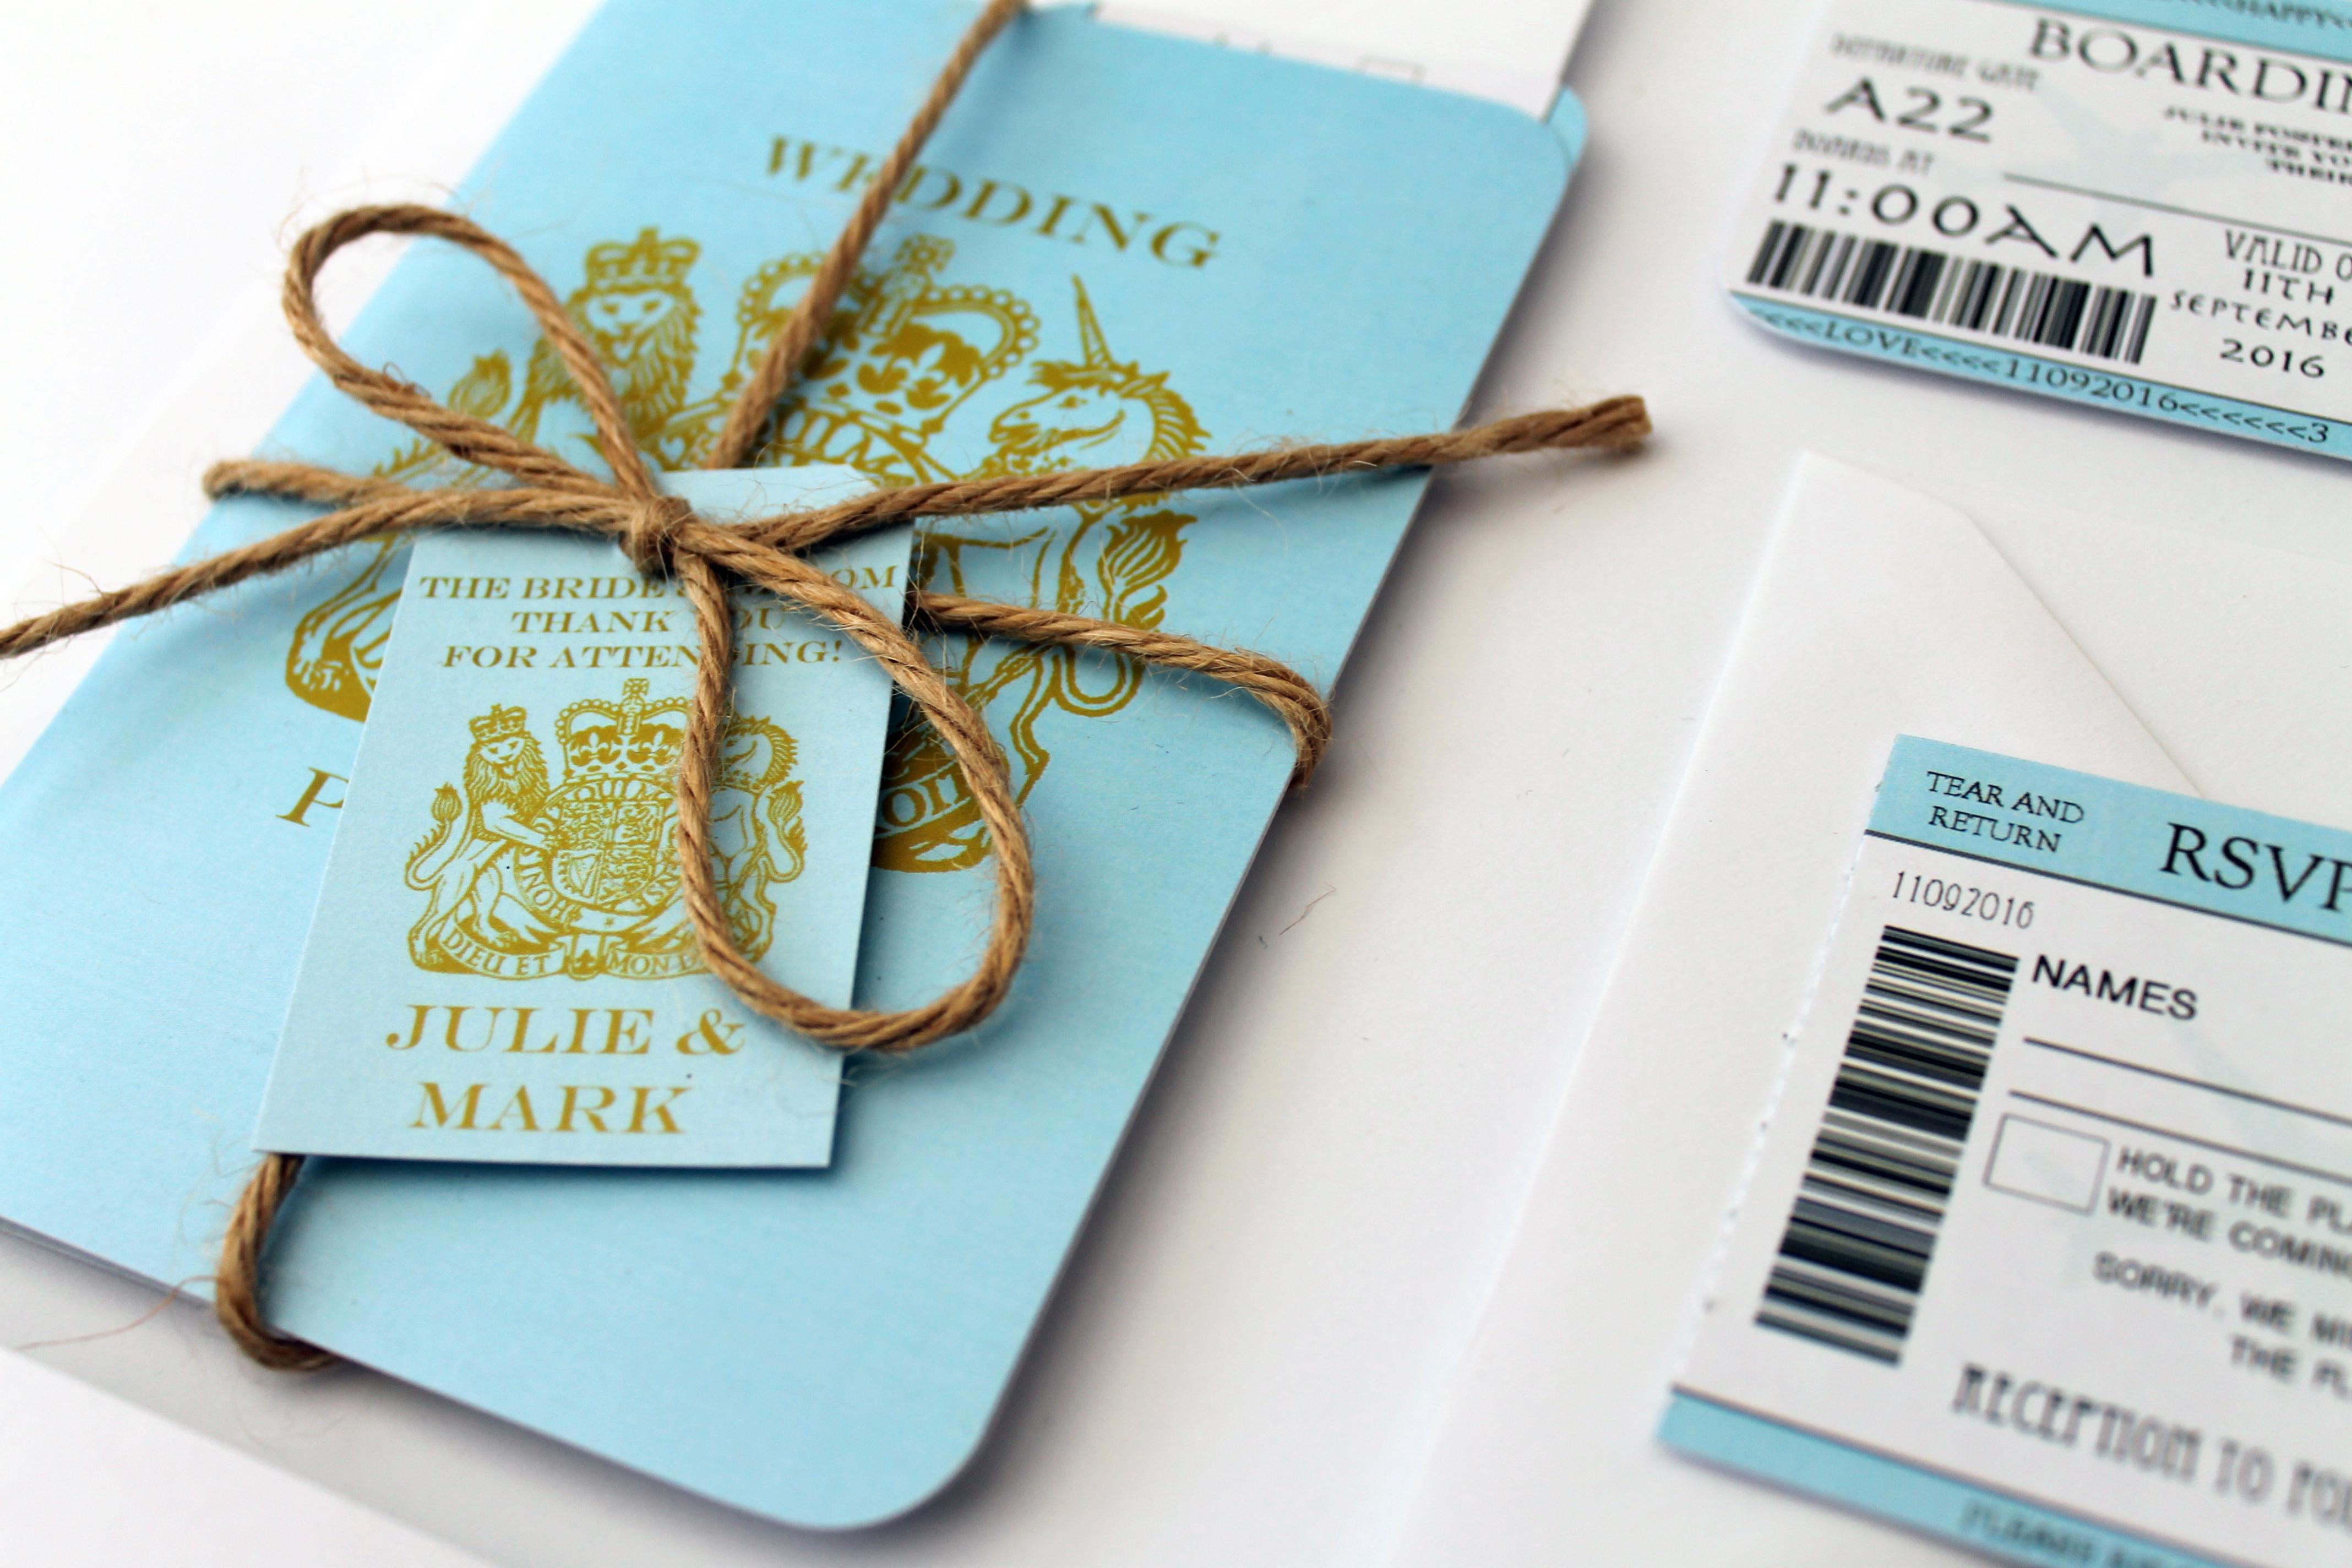 style Travel Wedding Invitation and RSVP setDestination wedding – Destination Wedding Invitations Passport